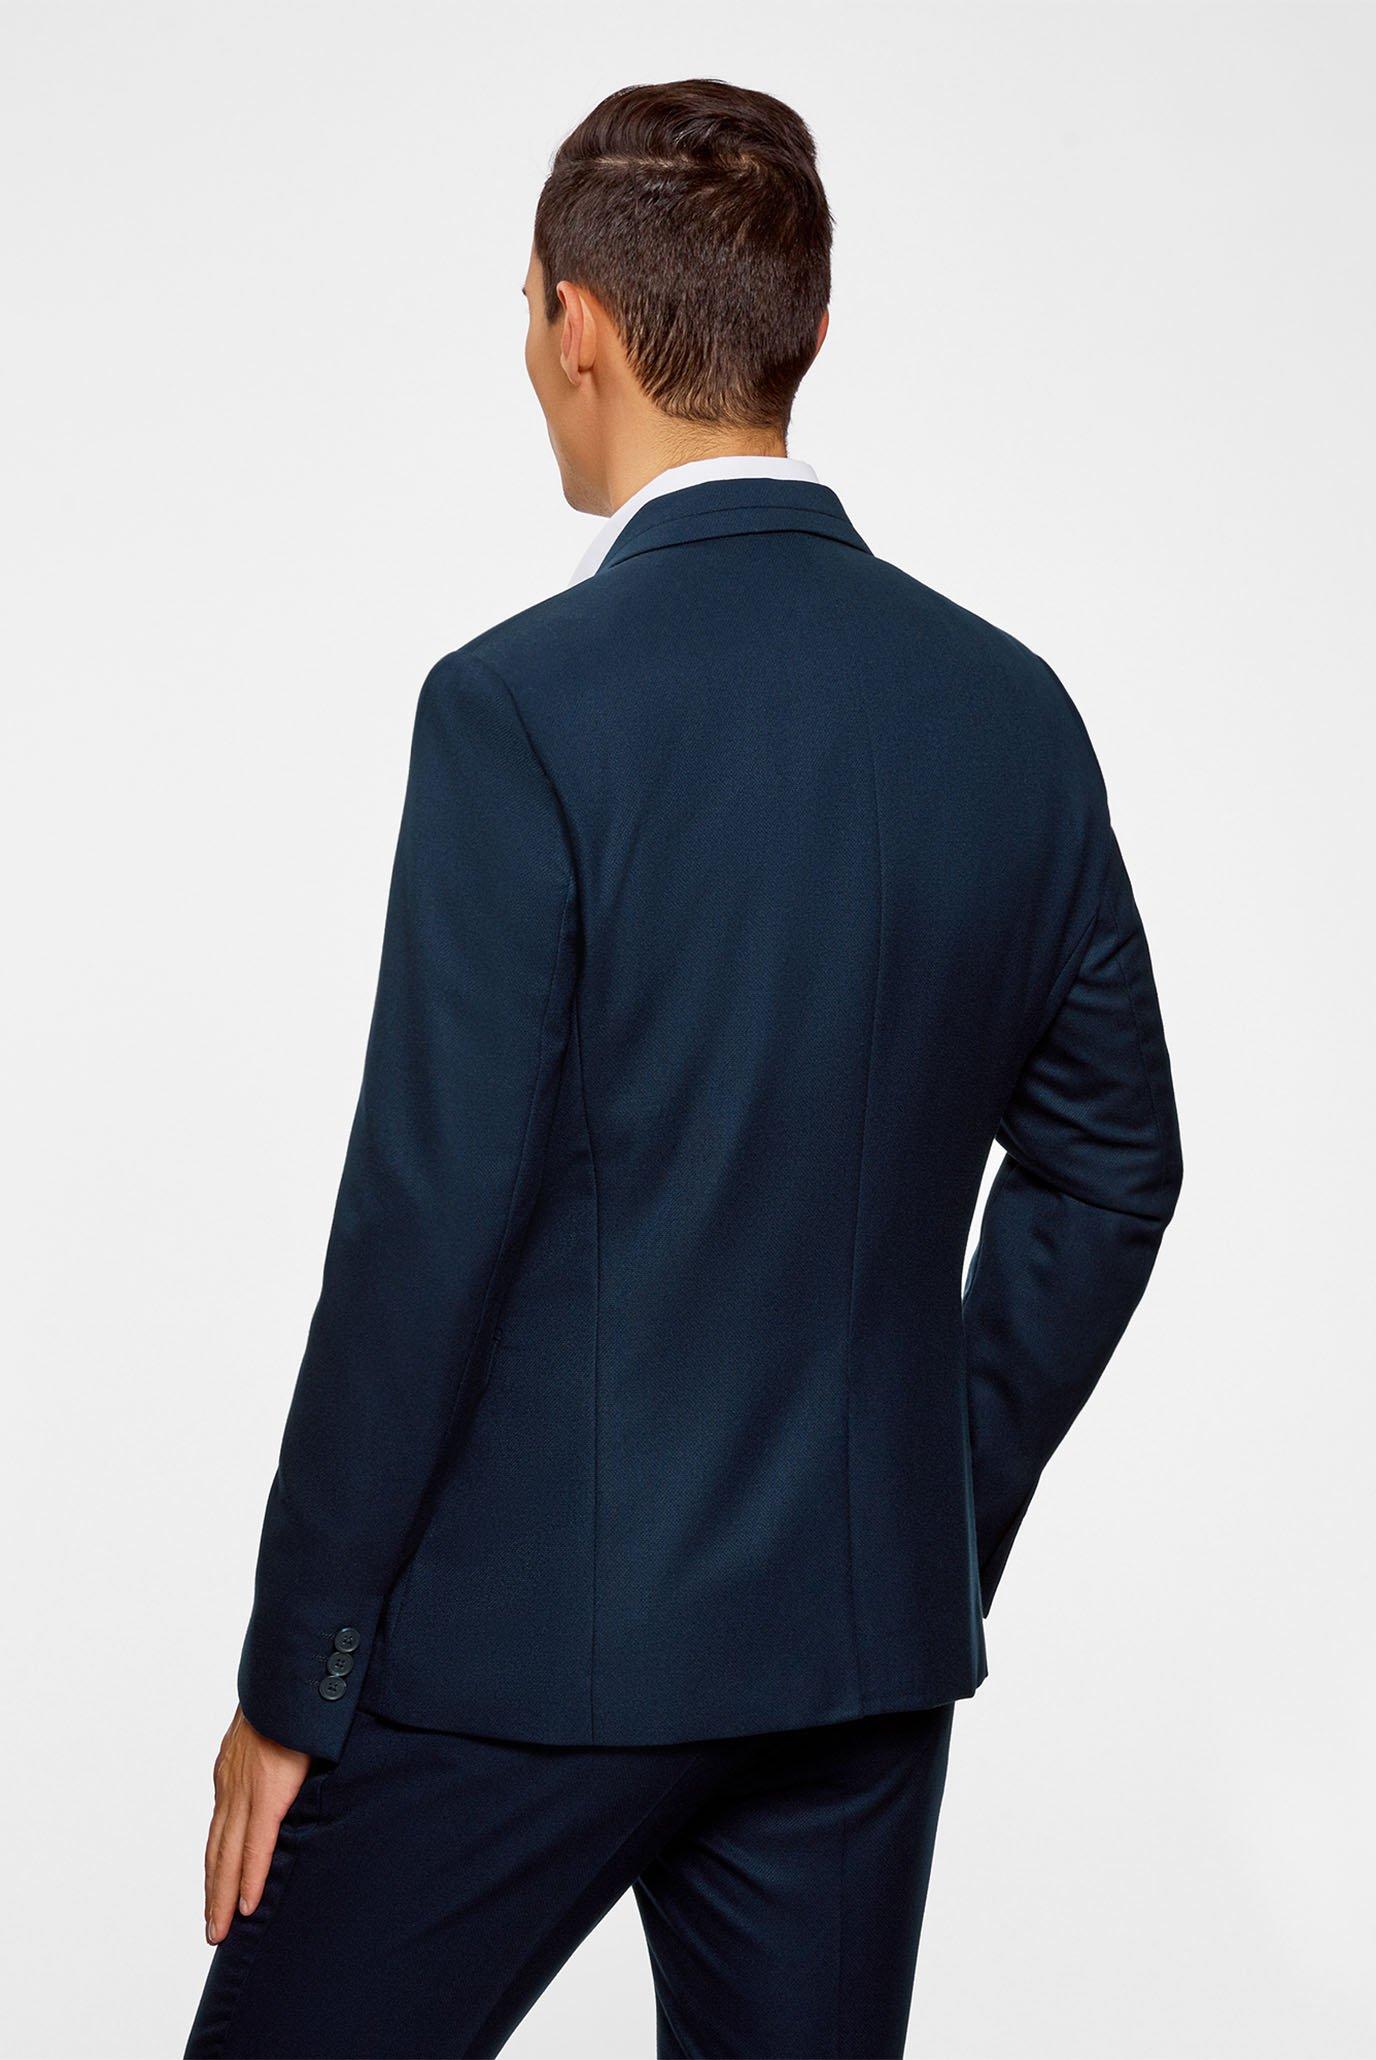 Купить Мужской синий пиджак Oodji Oodji 2L420203M/47080N/7900N – Киев, Украина. Цены в интернет магазине MD Fashion